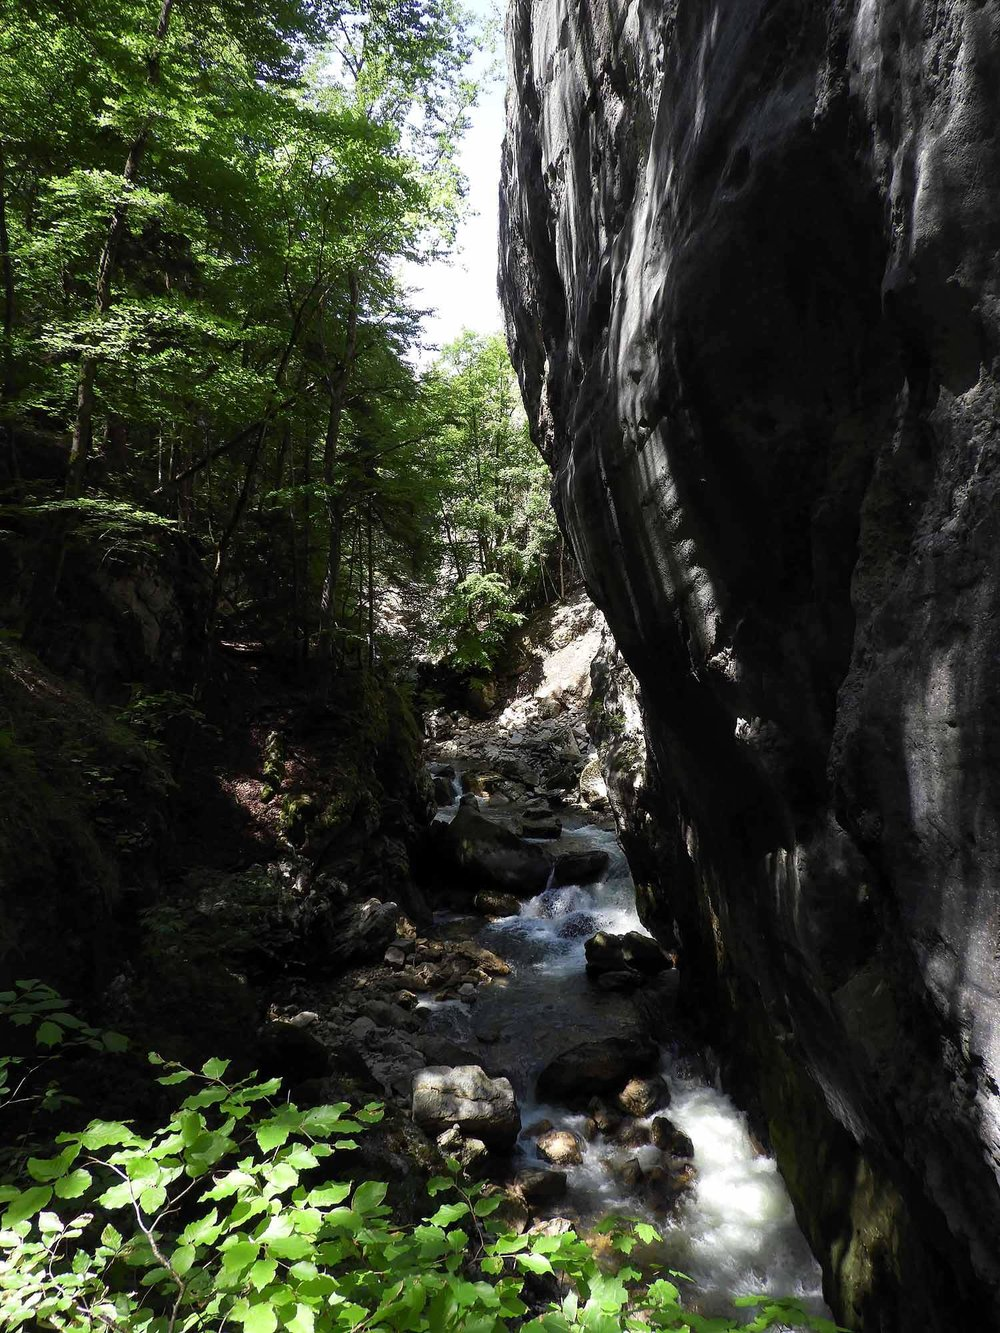 switzerland-saut-pont-brot-hike-walk-hiking-steep-ravine.JPG